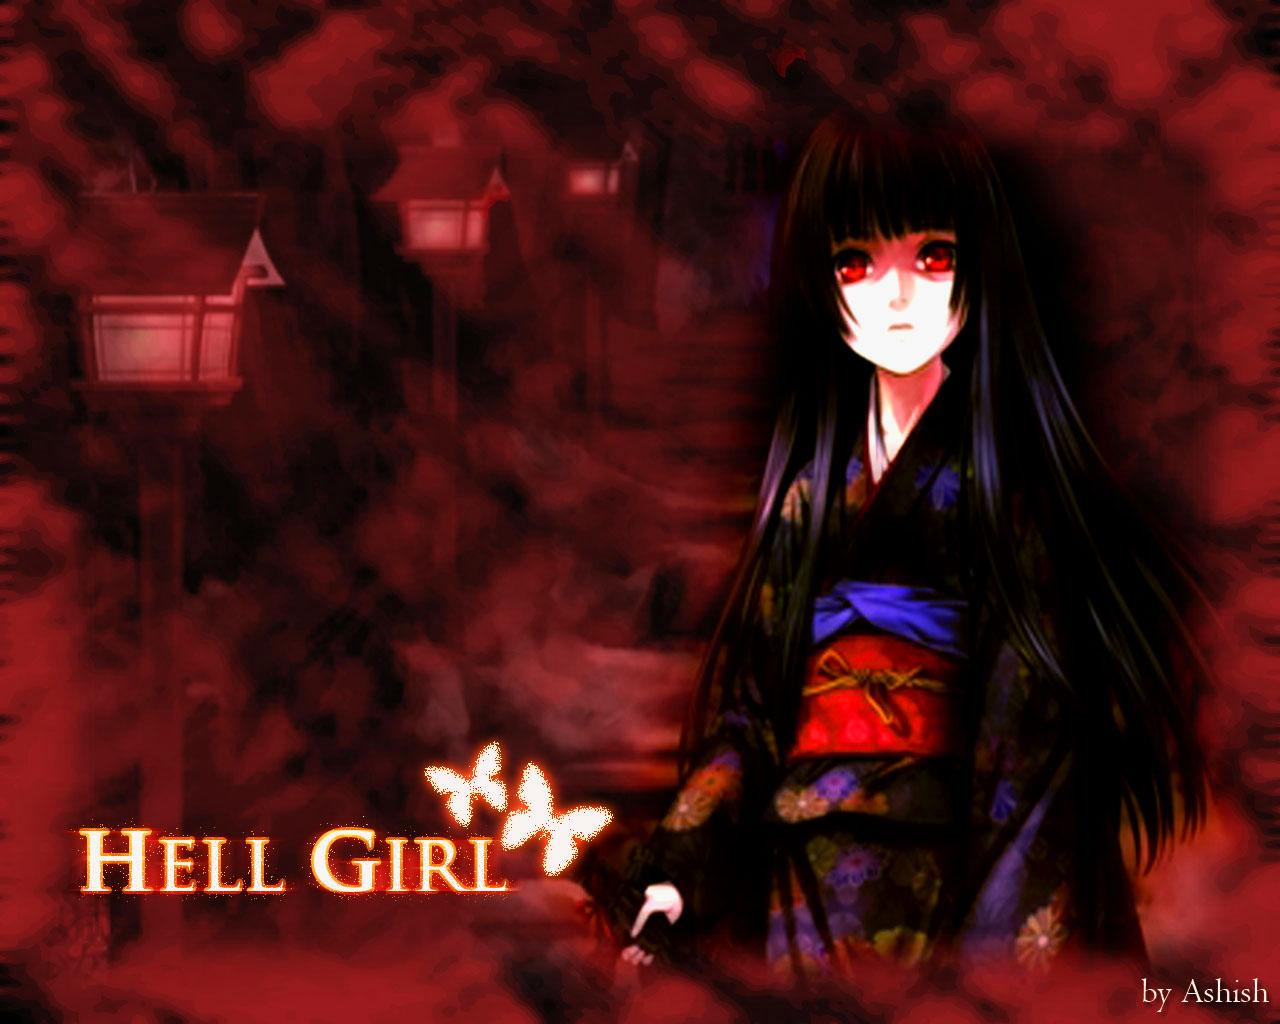 jigoku shoujo  hell girl  wallpaper by ashishartist d55nheyjpg 1280x1024